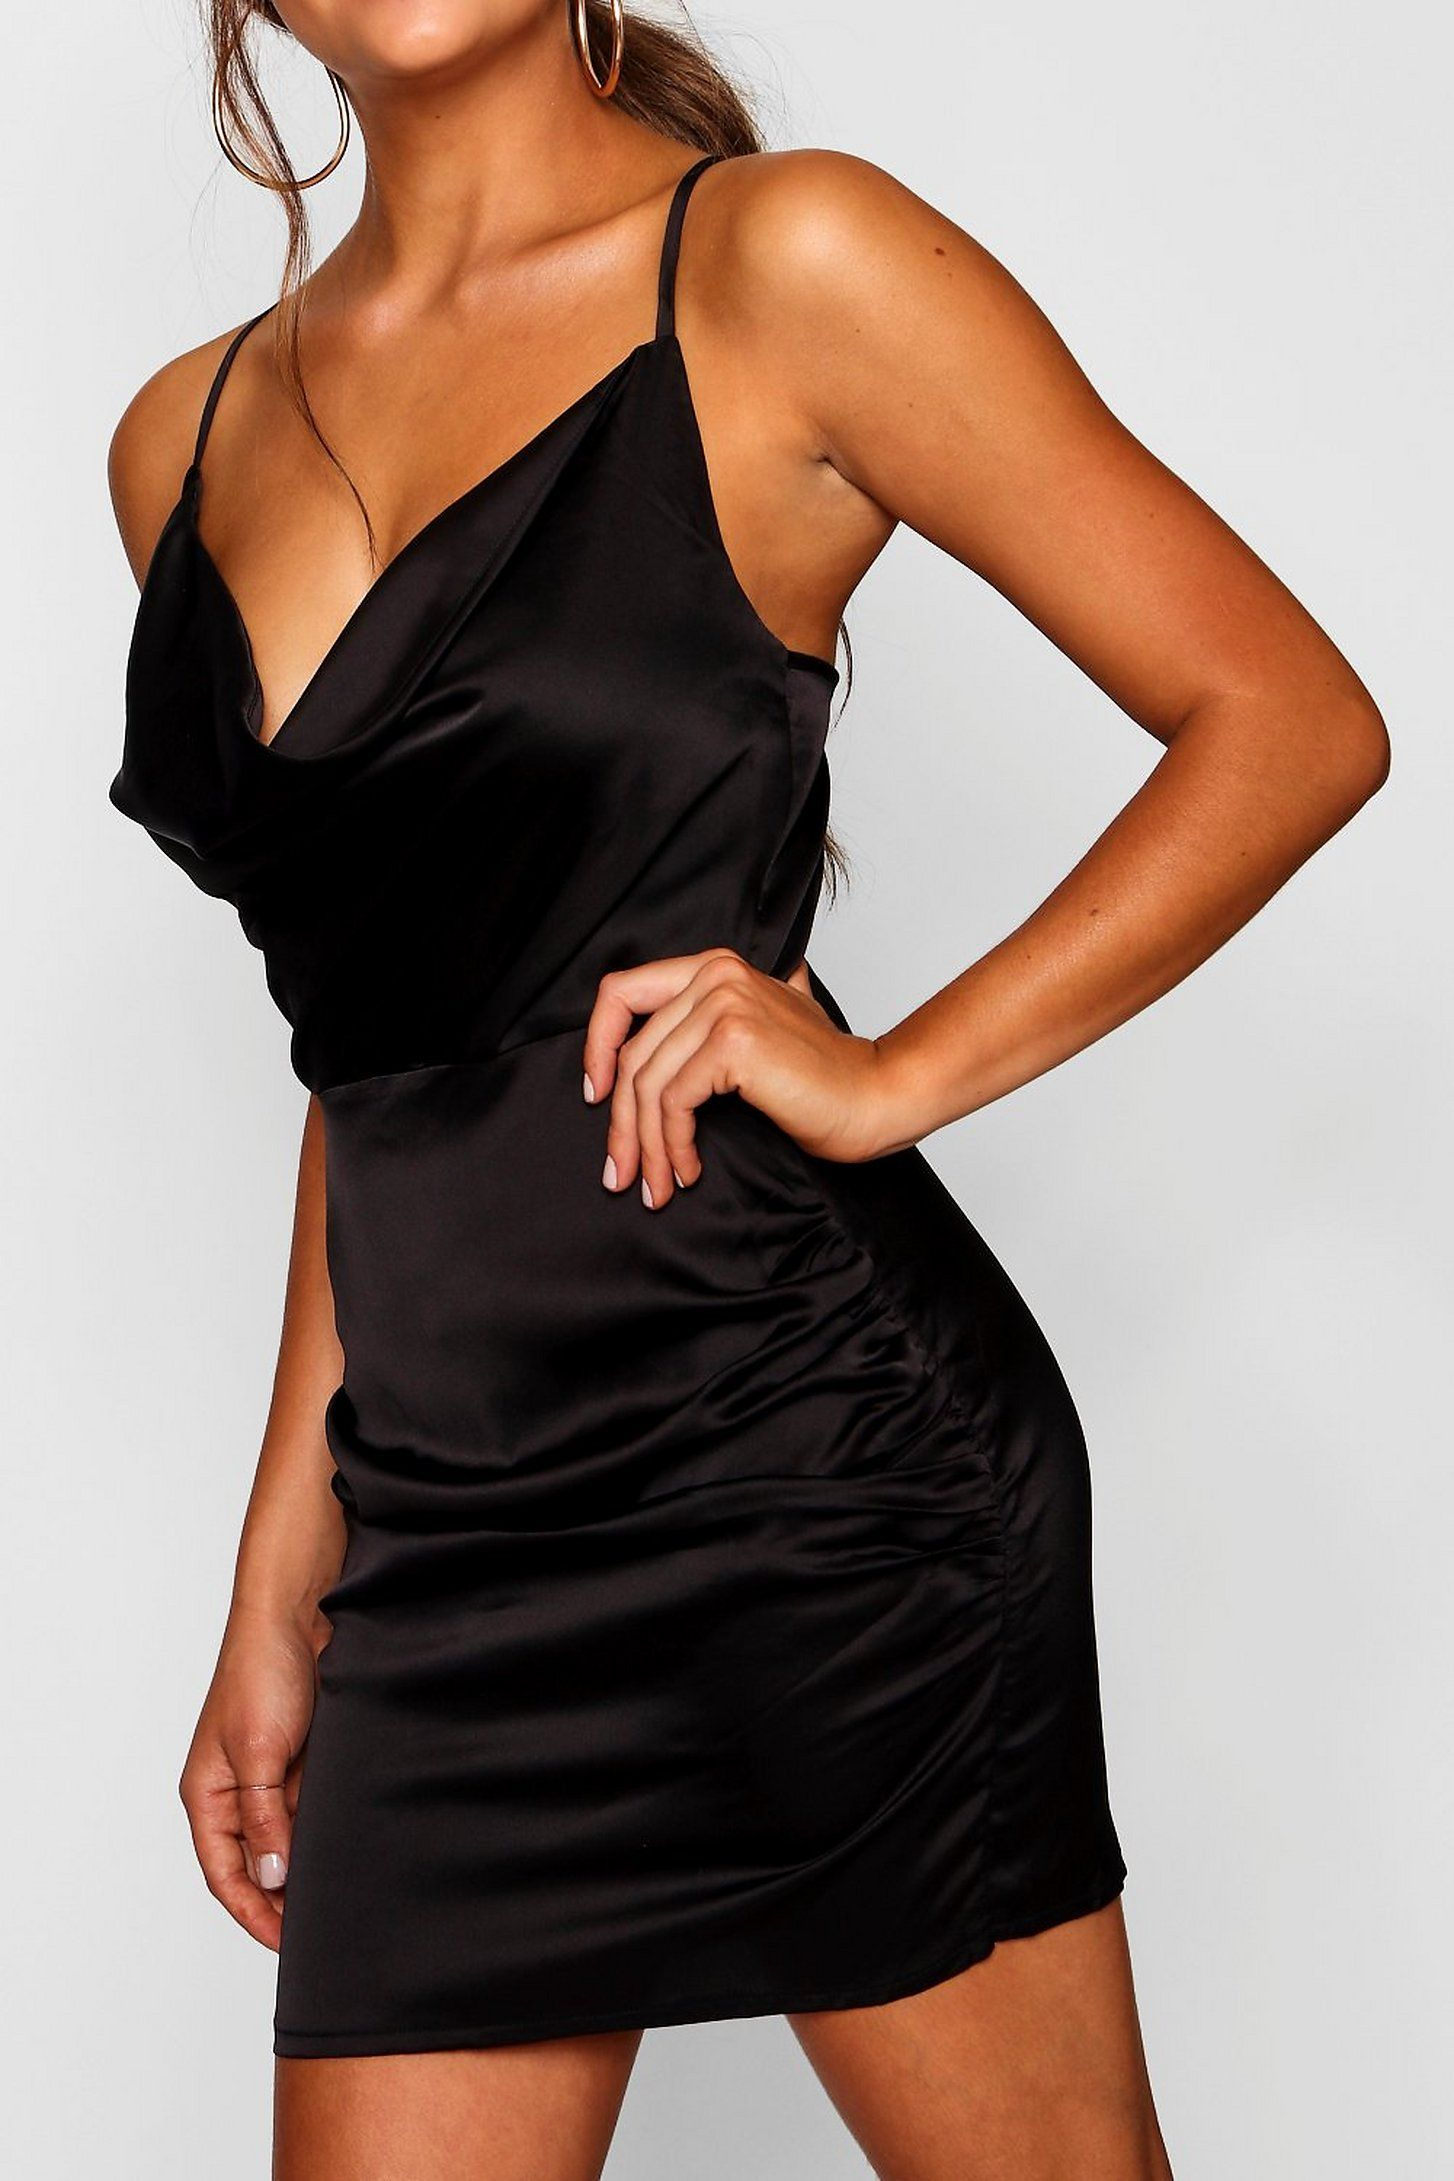 Fb508ef074ee78a0e58c68be06d8a2eb In 2020 Silk Dress Short Neck Bodycon Dress Black Short Dress